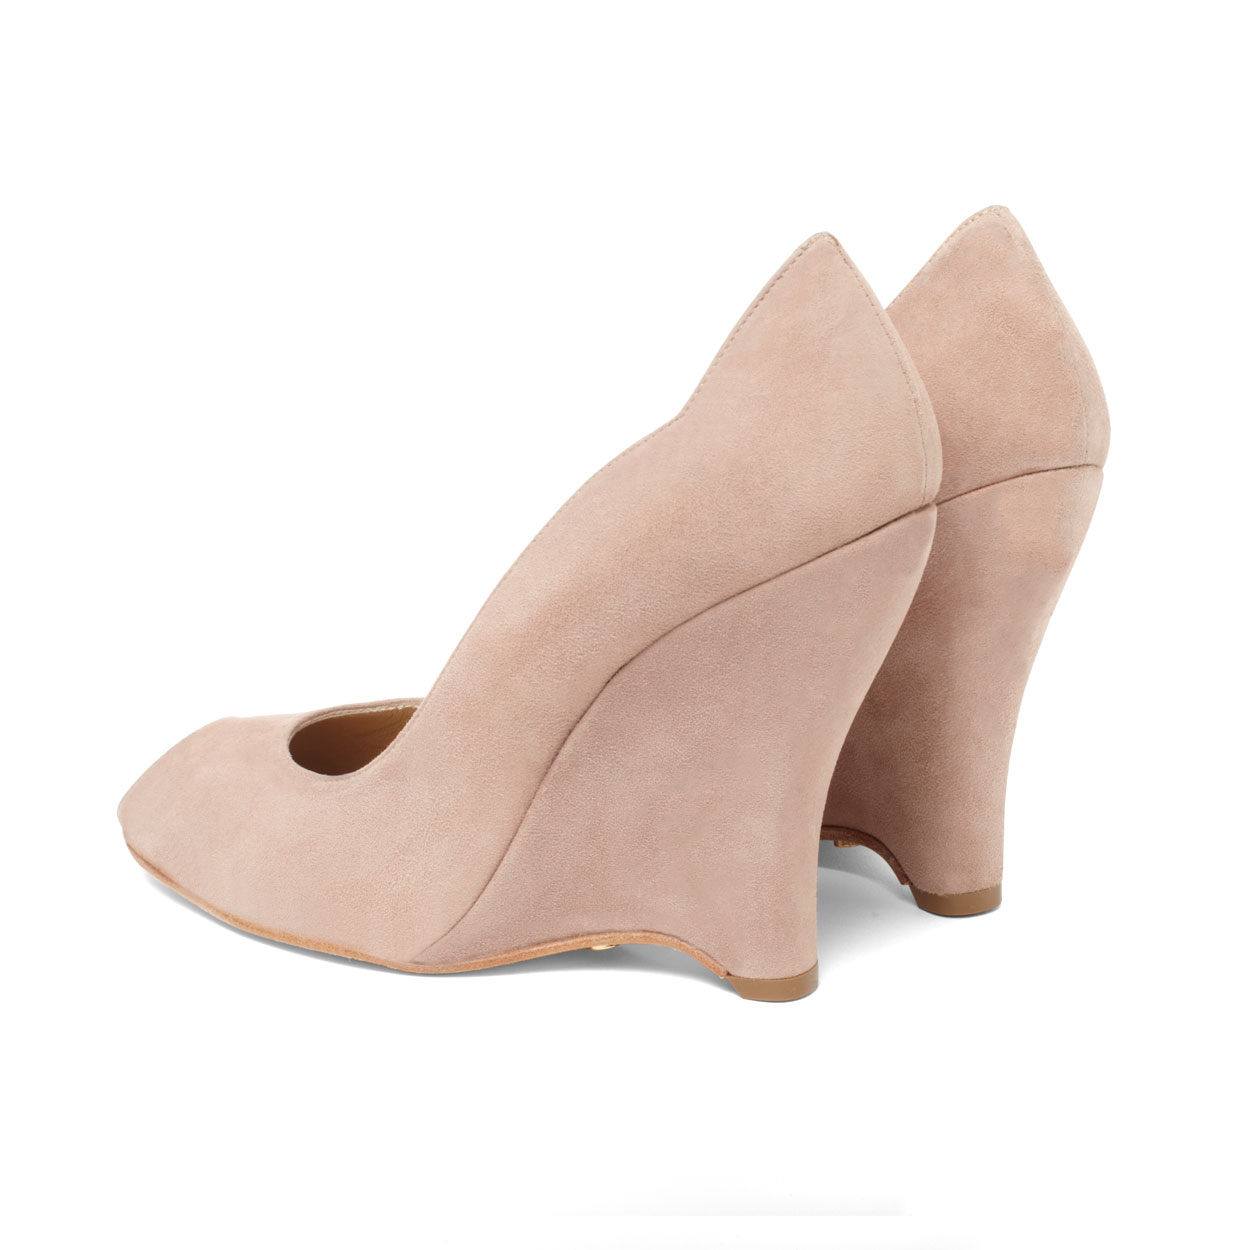 disco-nude-pair-back-london-designer-cleob-heels-shoes.jpg